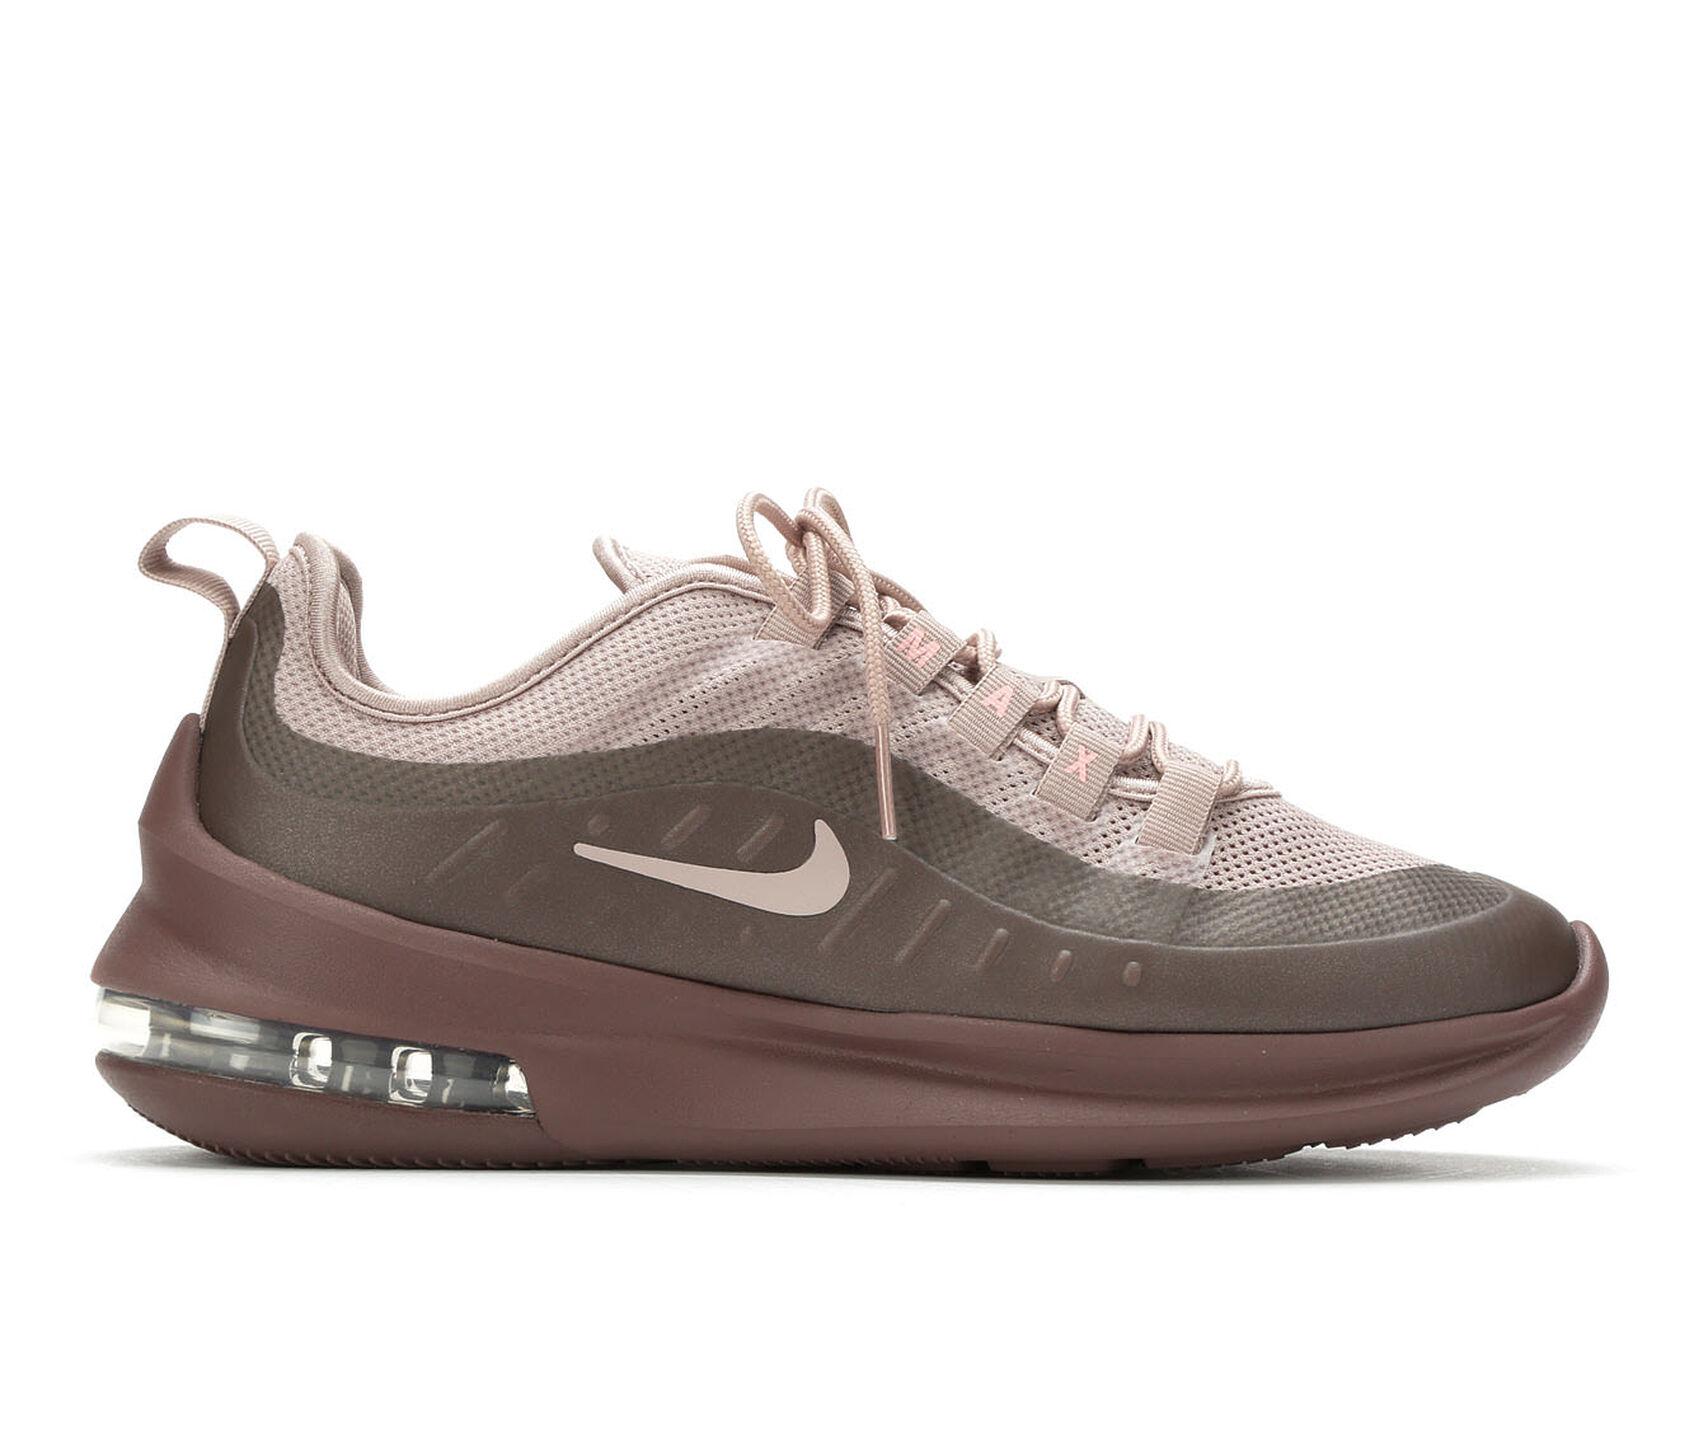 official photos 1c771 8a309 ... Nike Air Max Axis Running Shoes. Previous